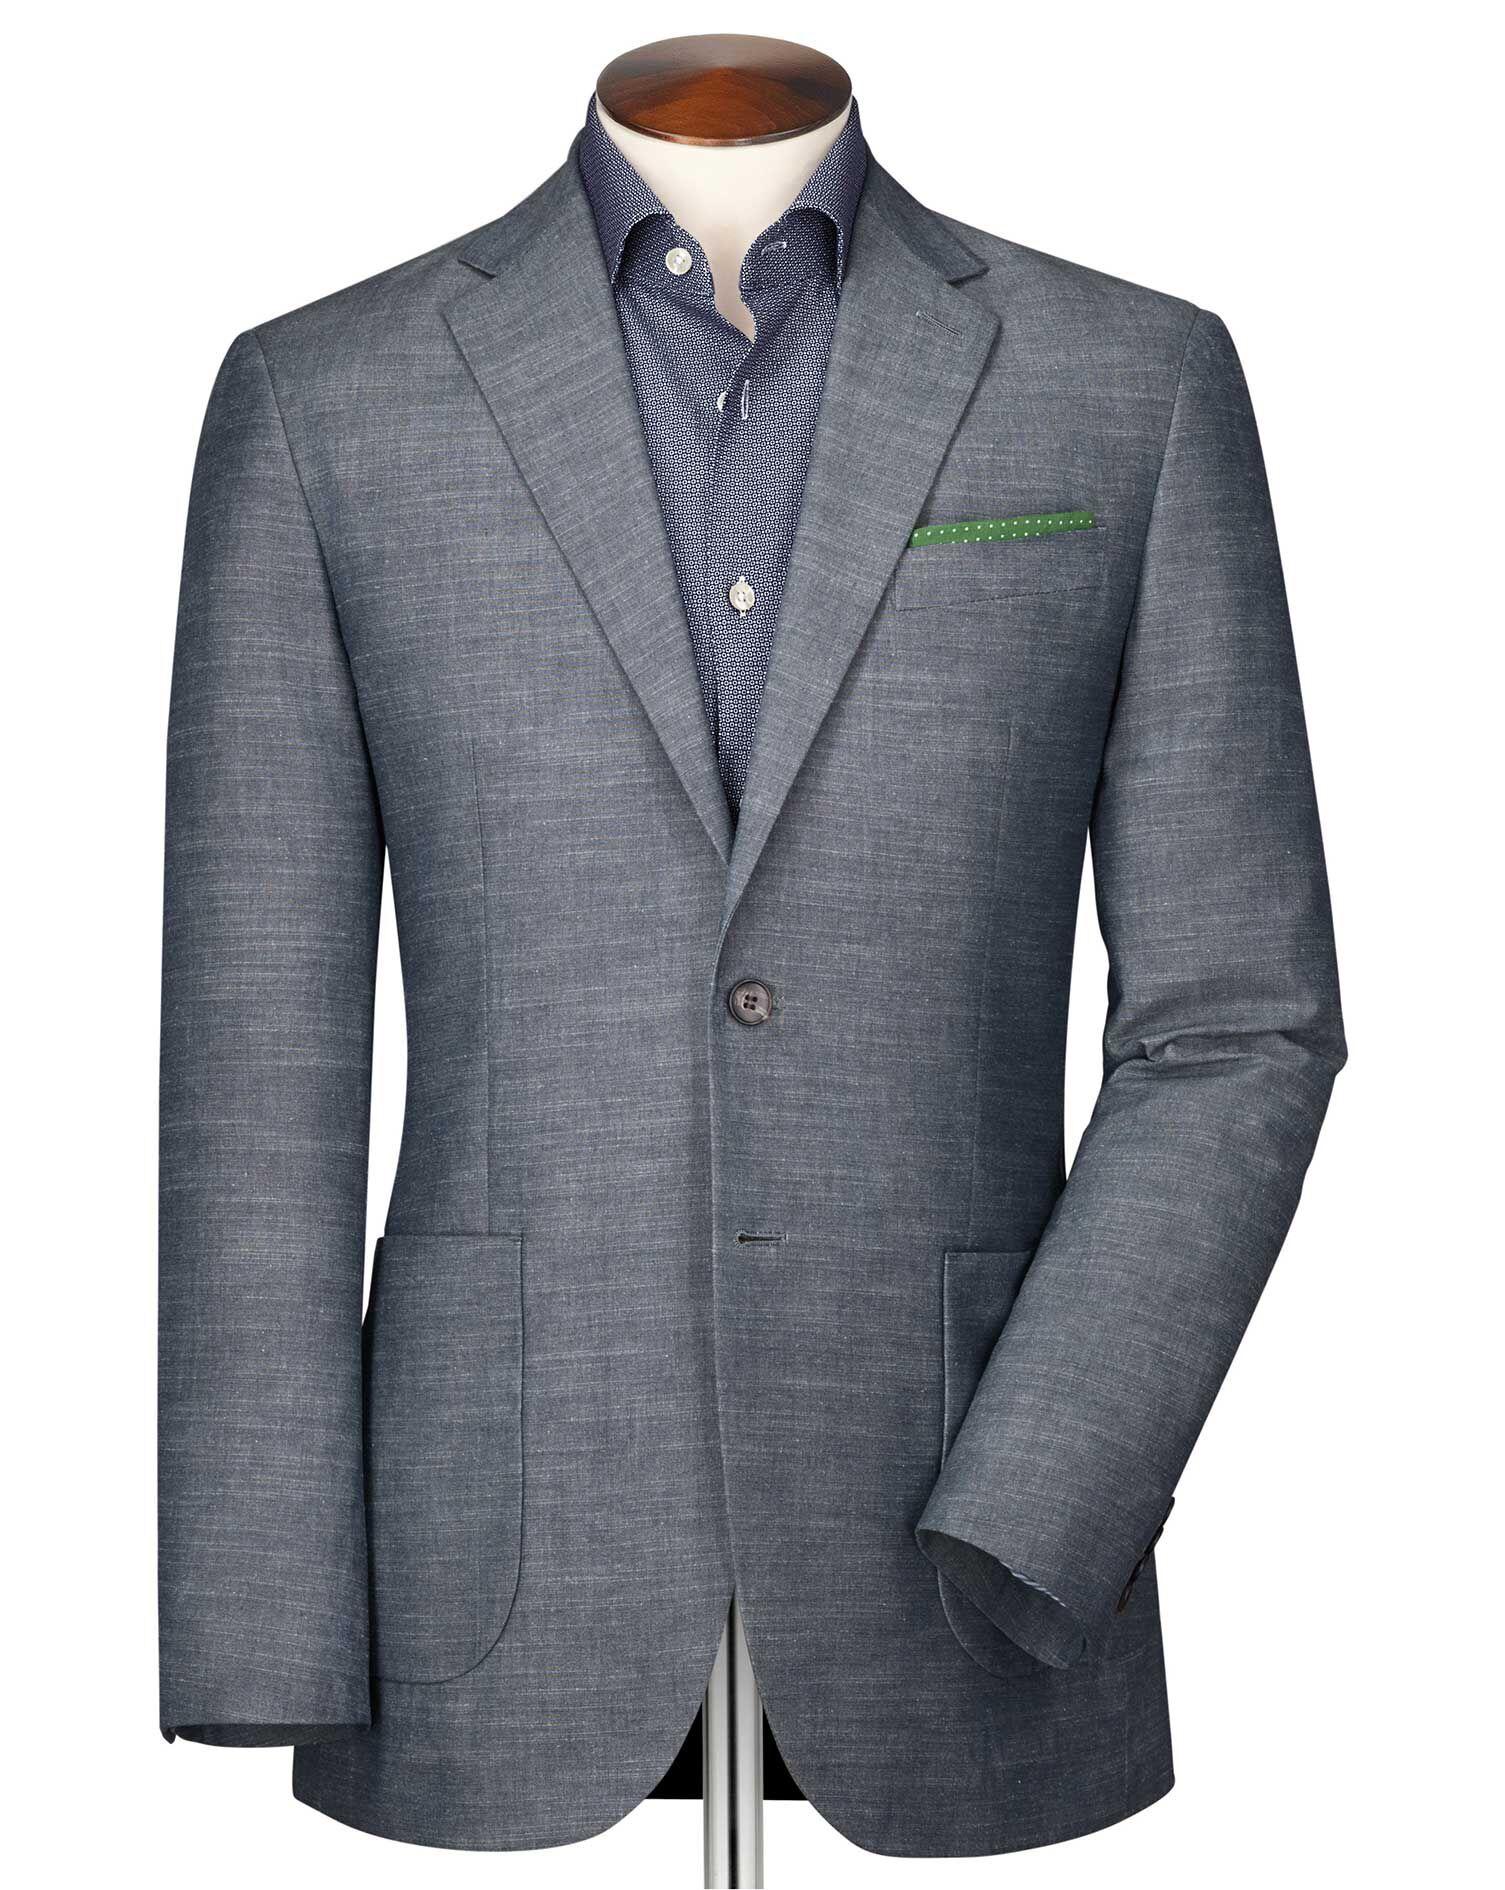 Slim Fit Chambray Semi-Plain Cotton Jacket Size 42 by Charles Tyrwhitt